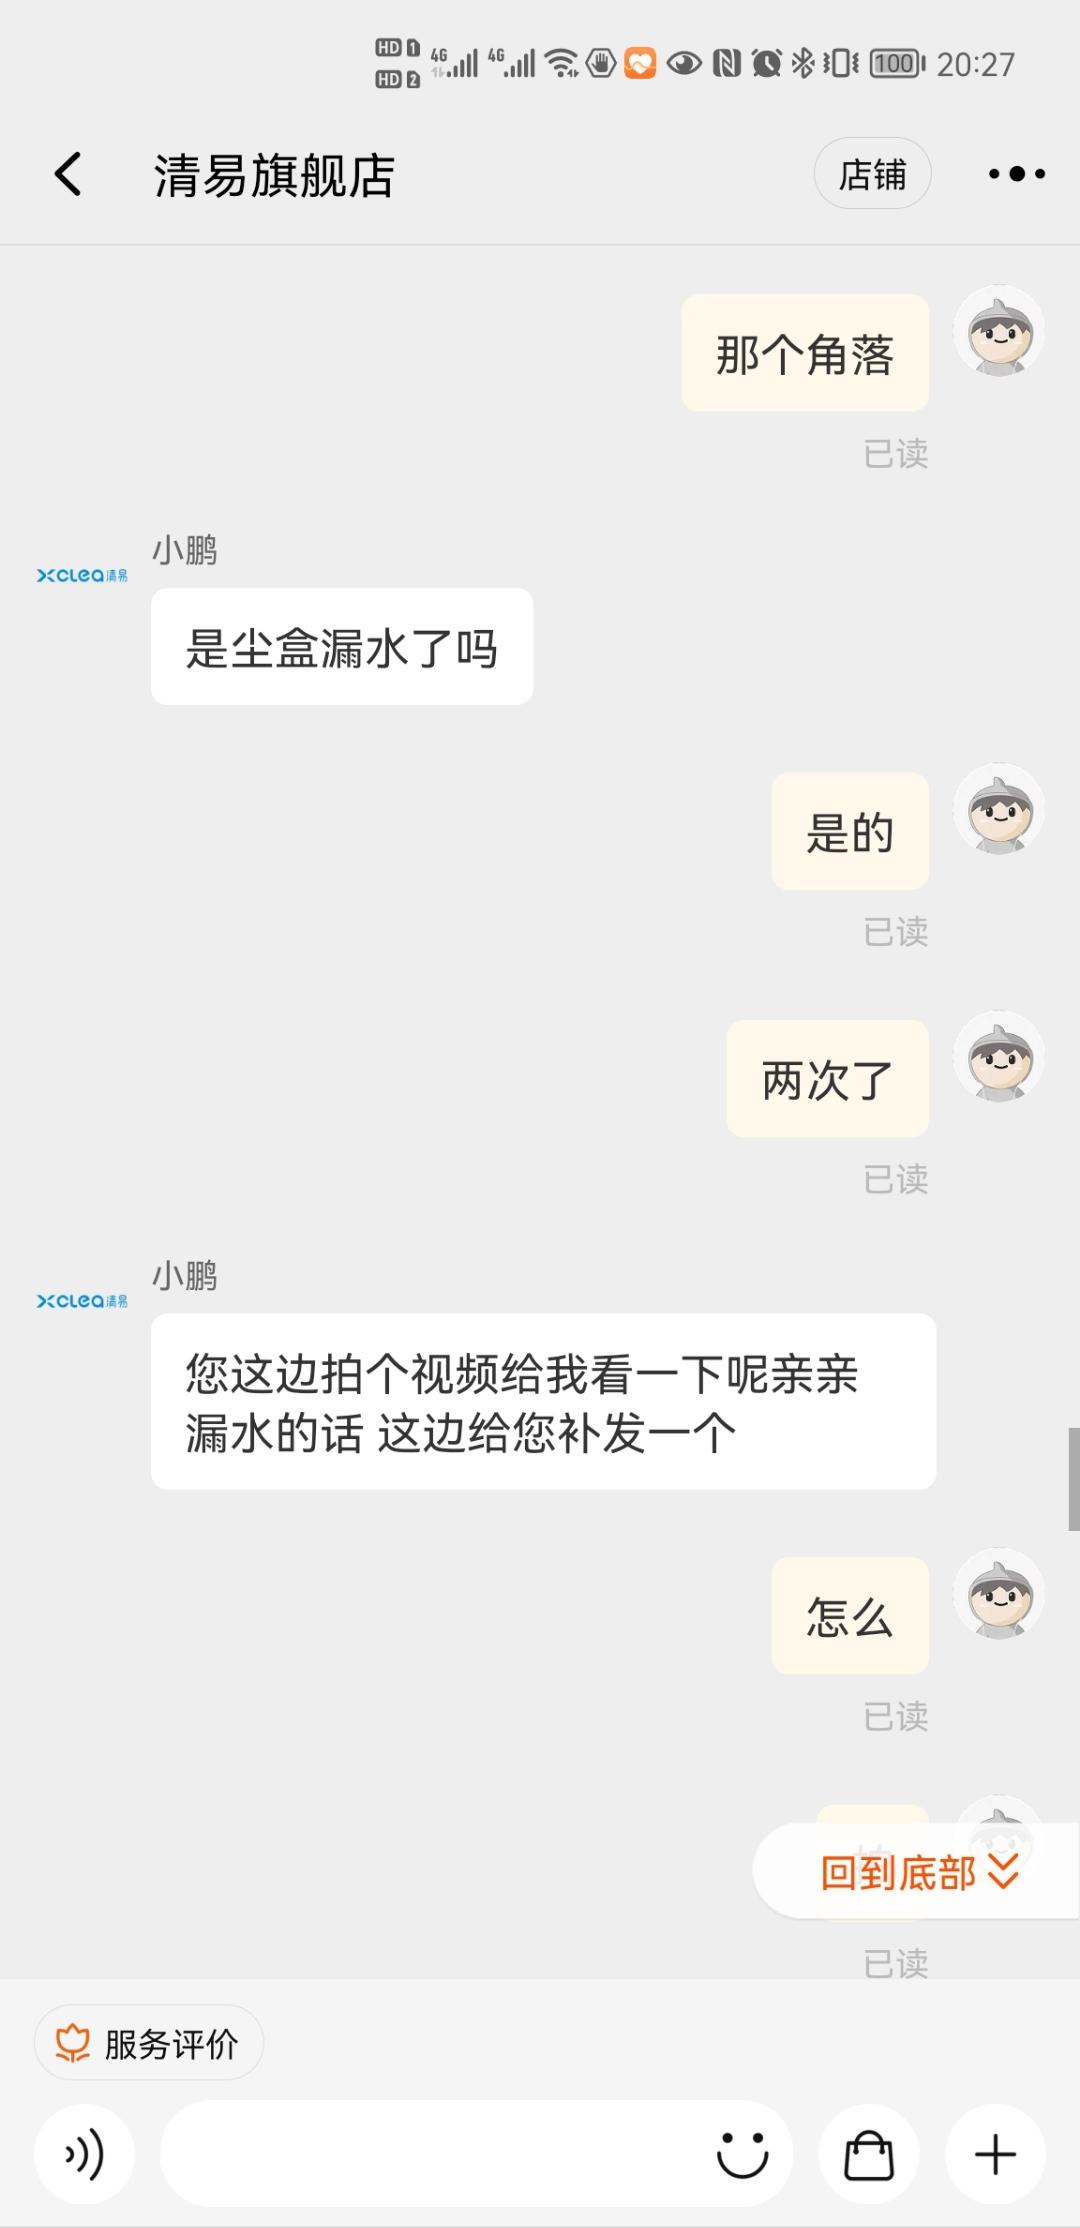 Screenshot_20210903_202746_com.taobao.taobao.jpg